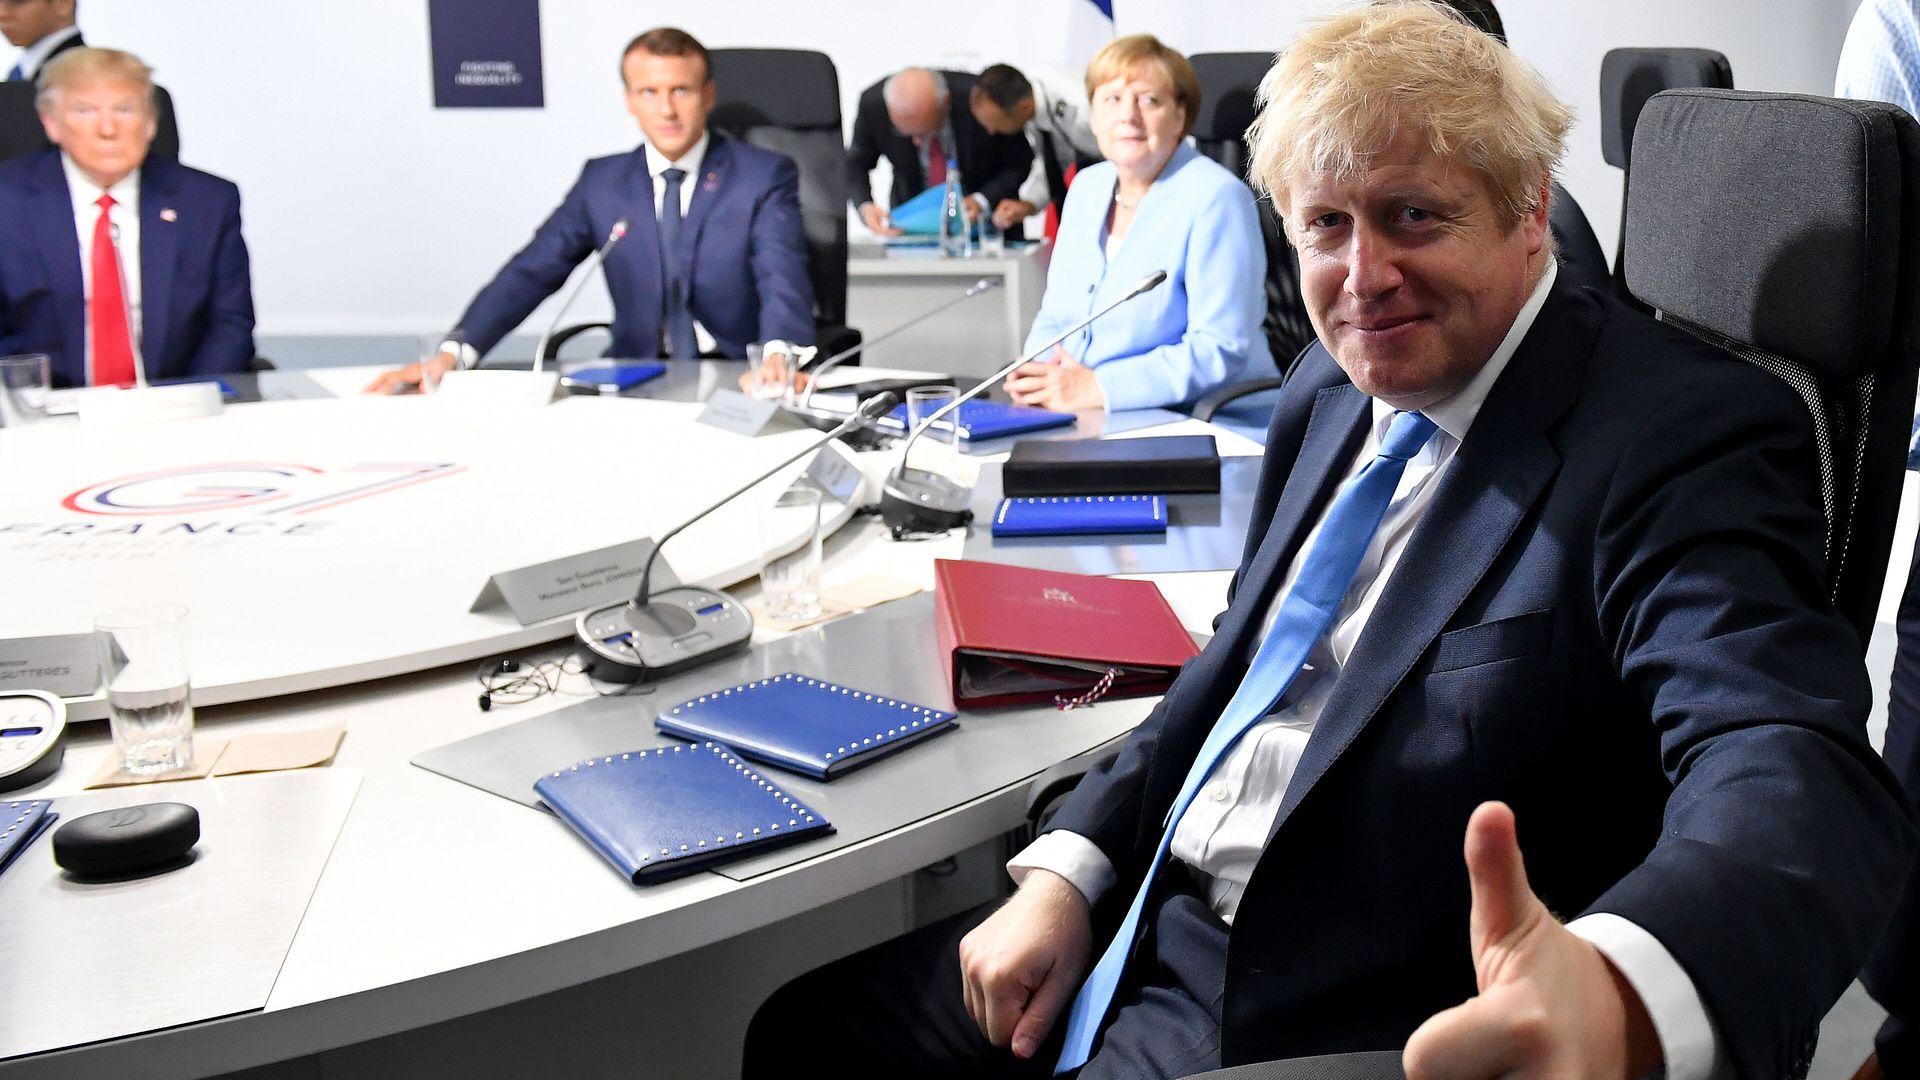 Boris Johnson at a meeting of the G7 alongside Angela Merkel, Emmanuel Macron and Donald Trump - Credit: PA